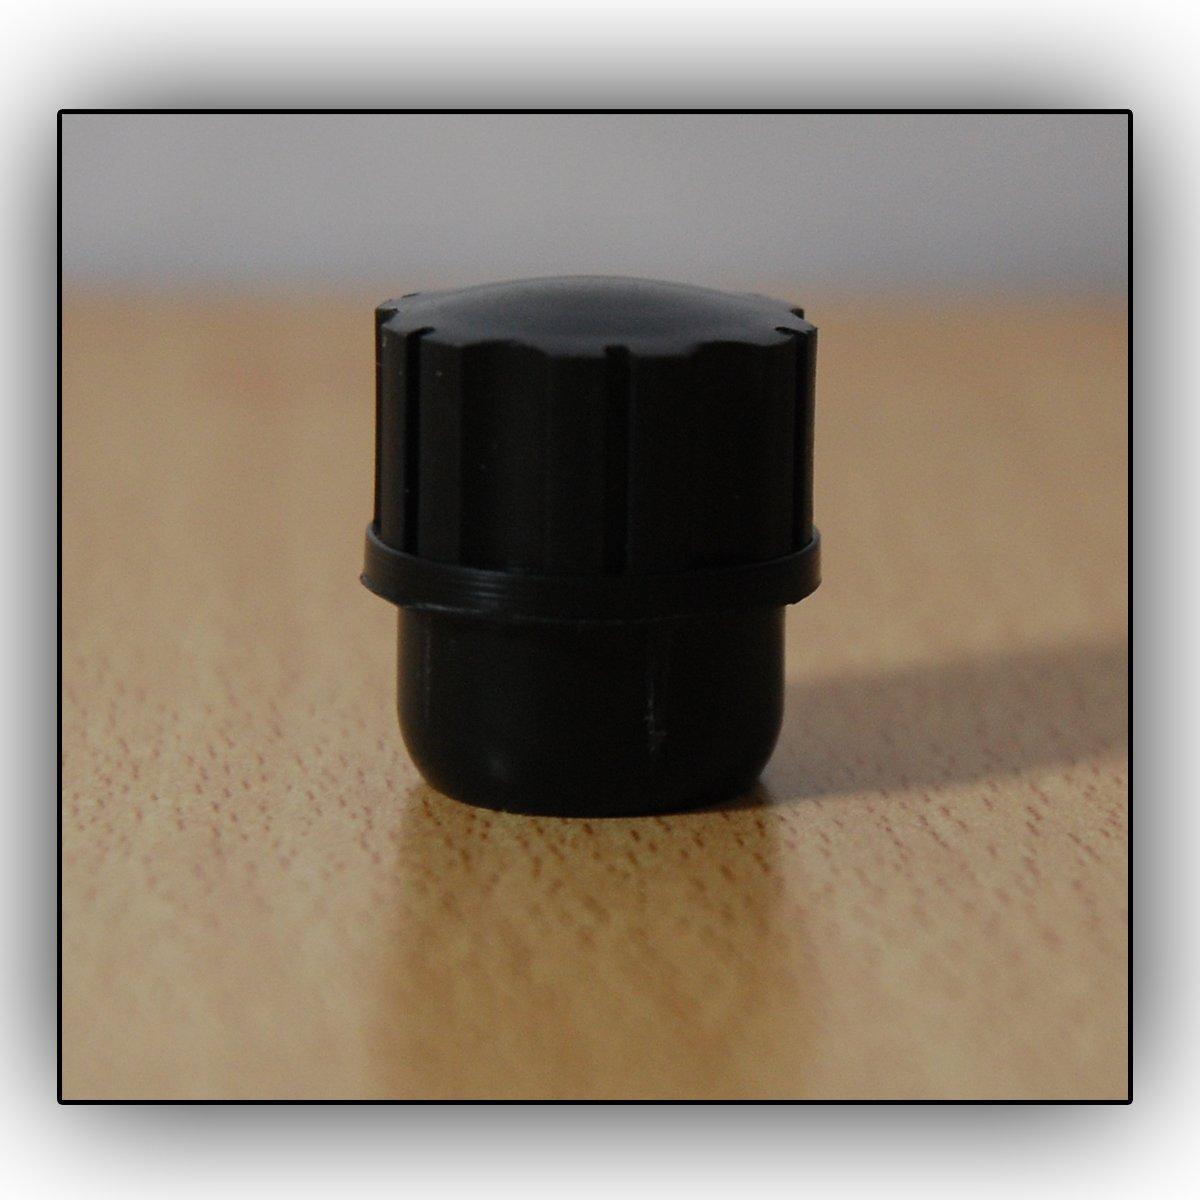 8cojines de boquilla/pastillas protège-bec para Clarinete/Saxofón Soundman